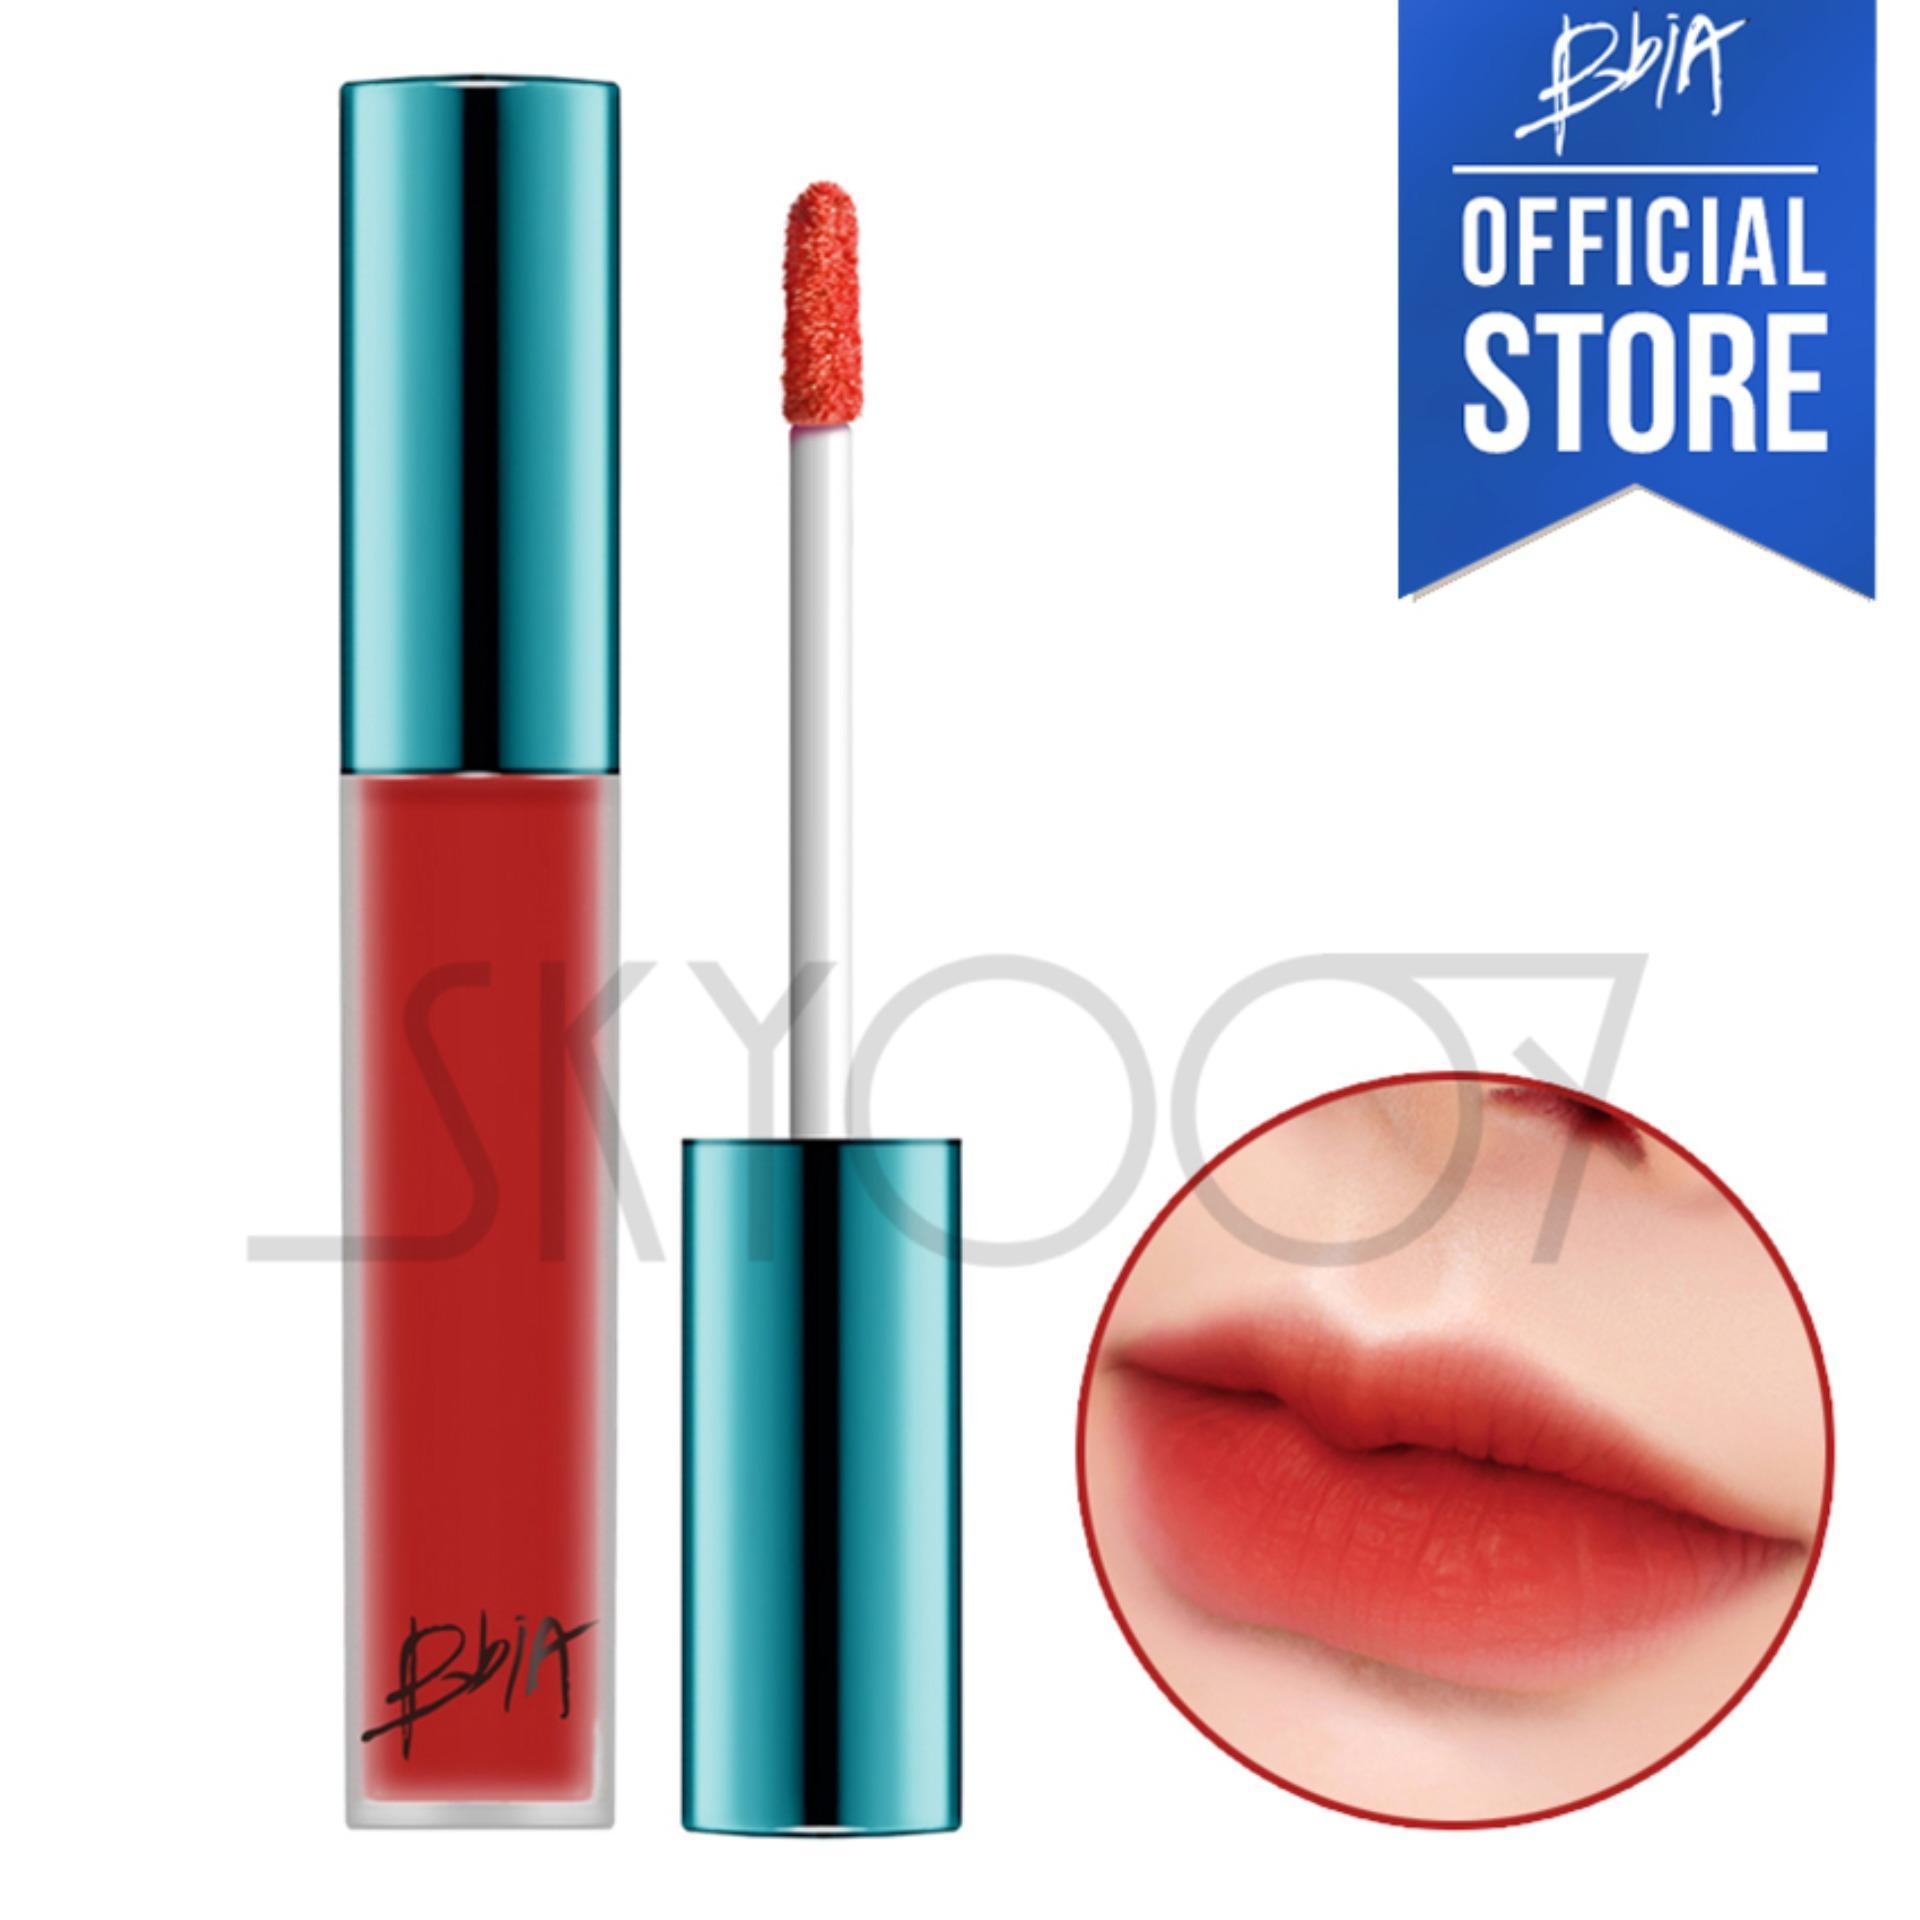 Giá Bán Son Kem Li Sieu Lau Troi Bbia Last Velvet Lip Tint Version 1 04 Extra Mood Mau Đỏ Bbia Nguyên